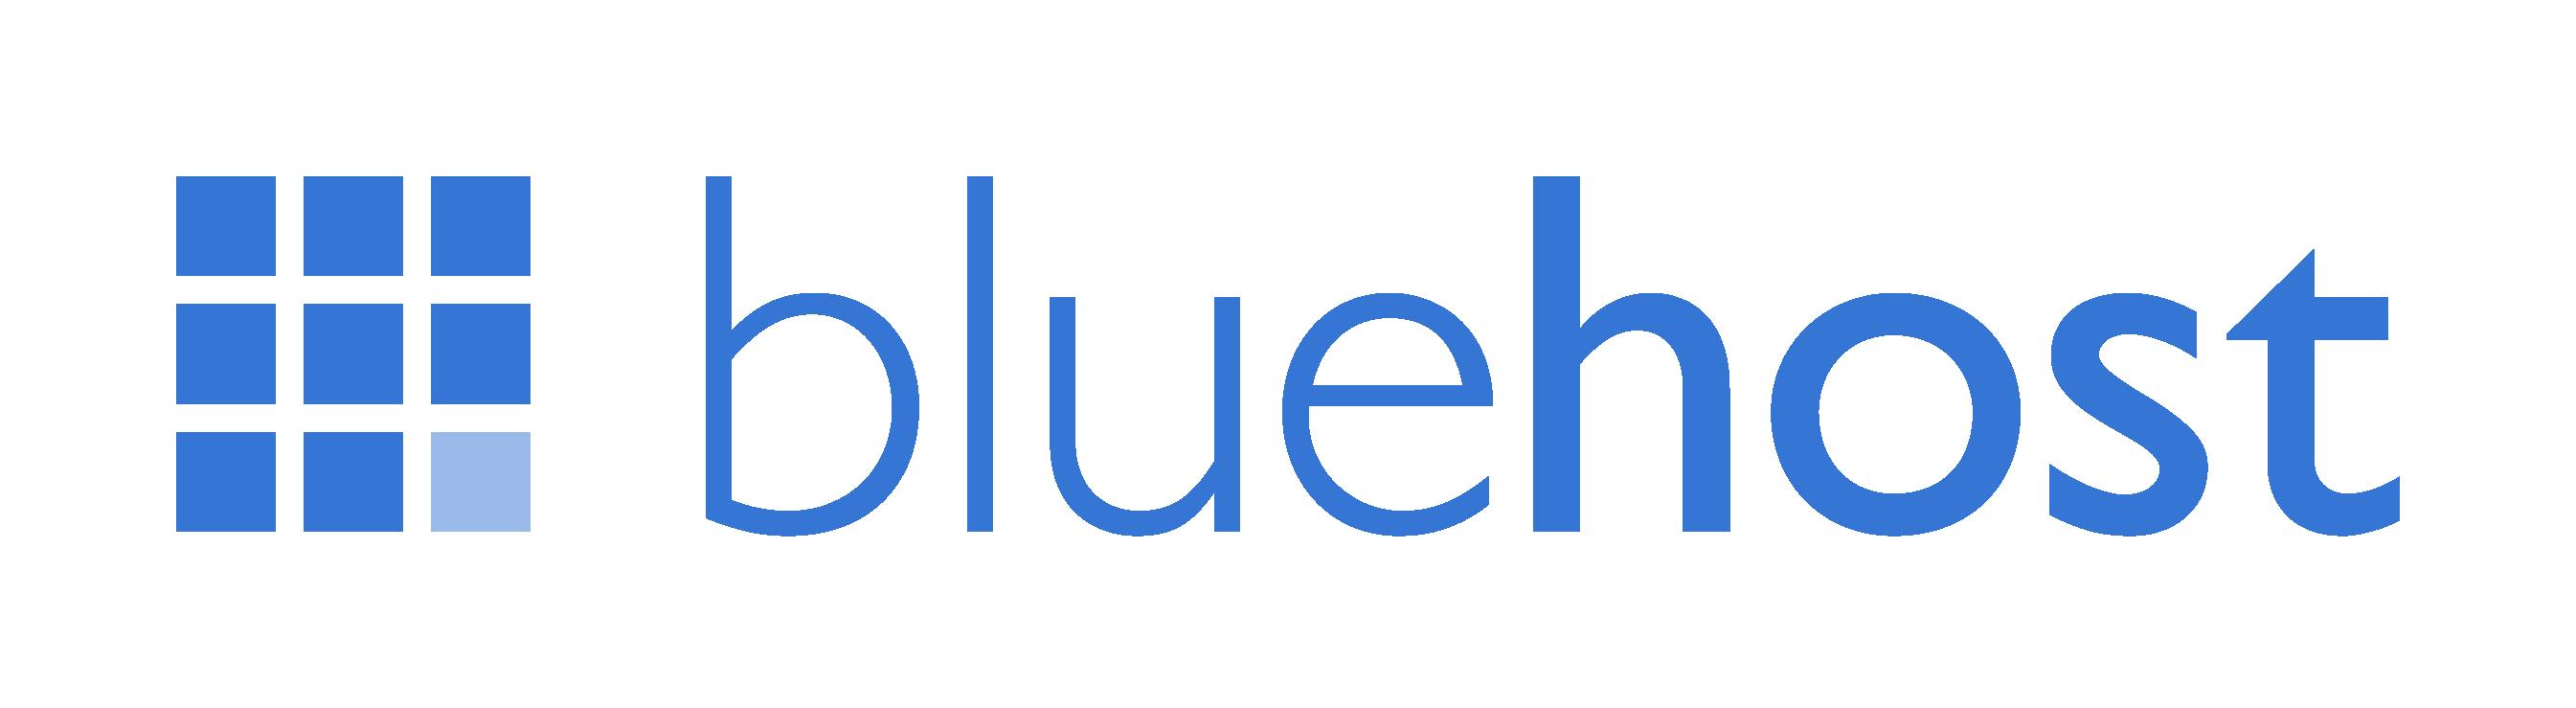 bluehost hosting site 2020